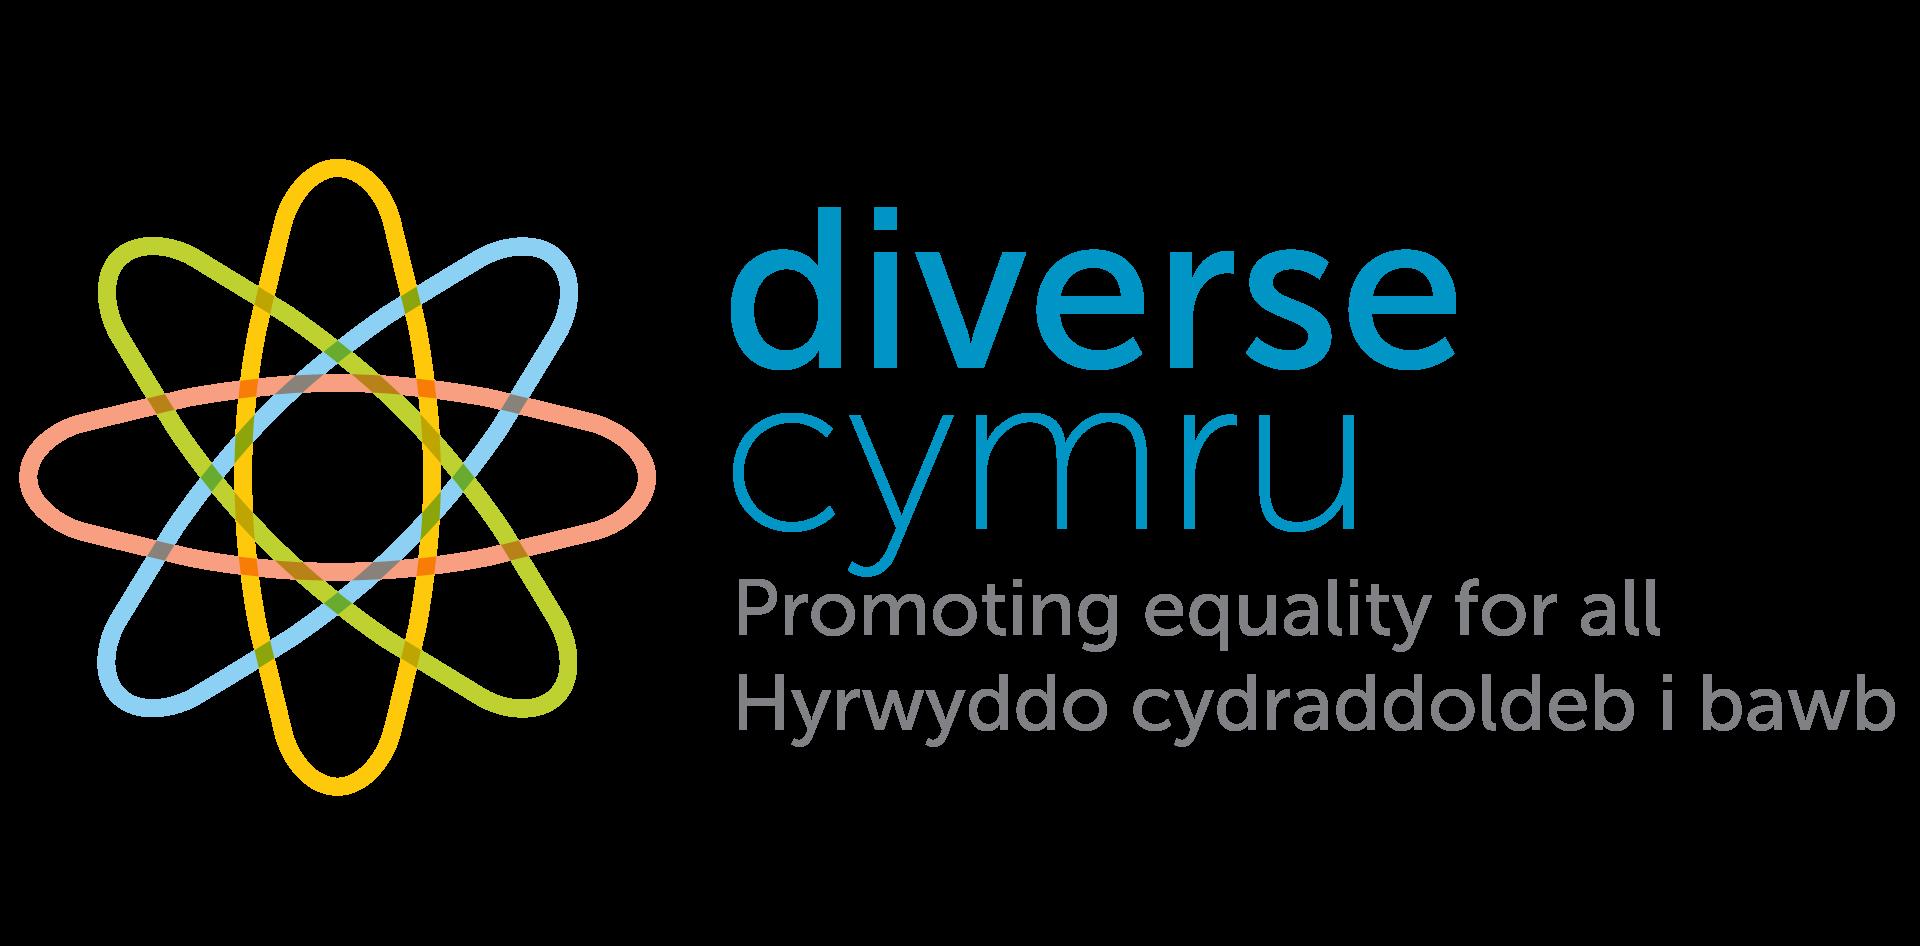 DiverseCymru_Colour_strap-BILINGUAL1920.png